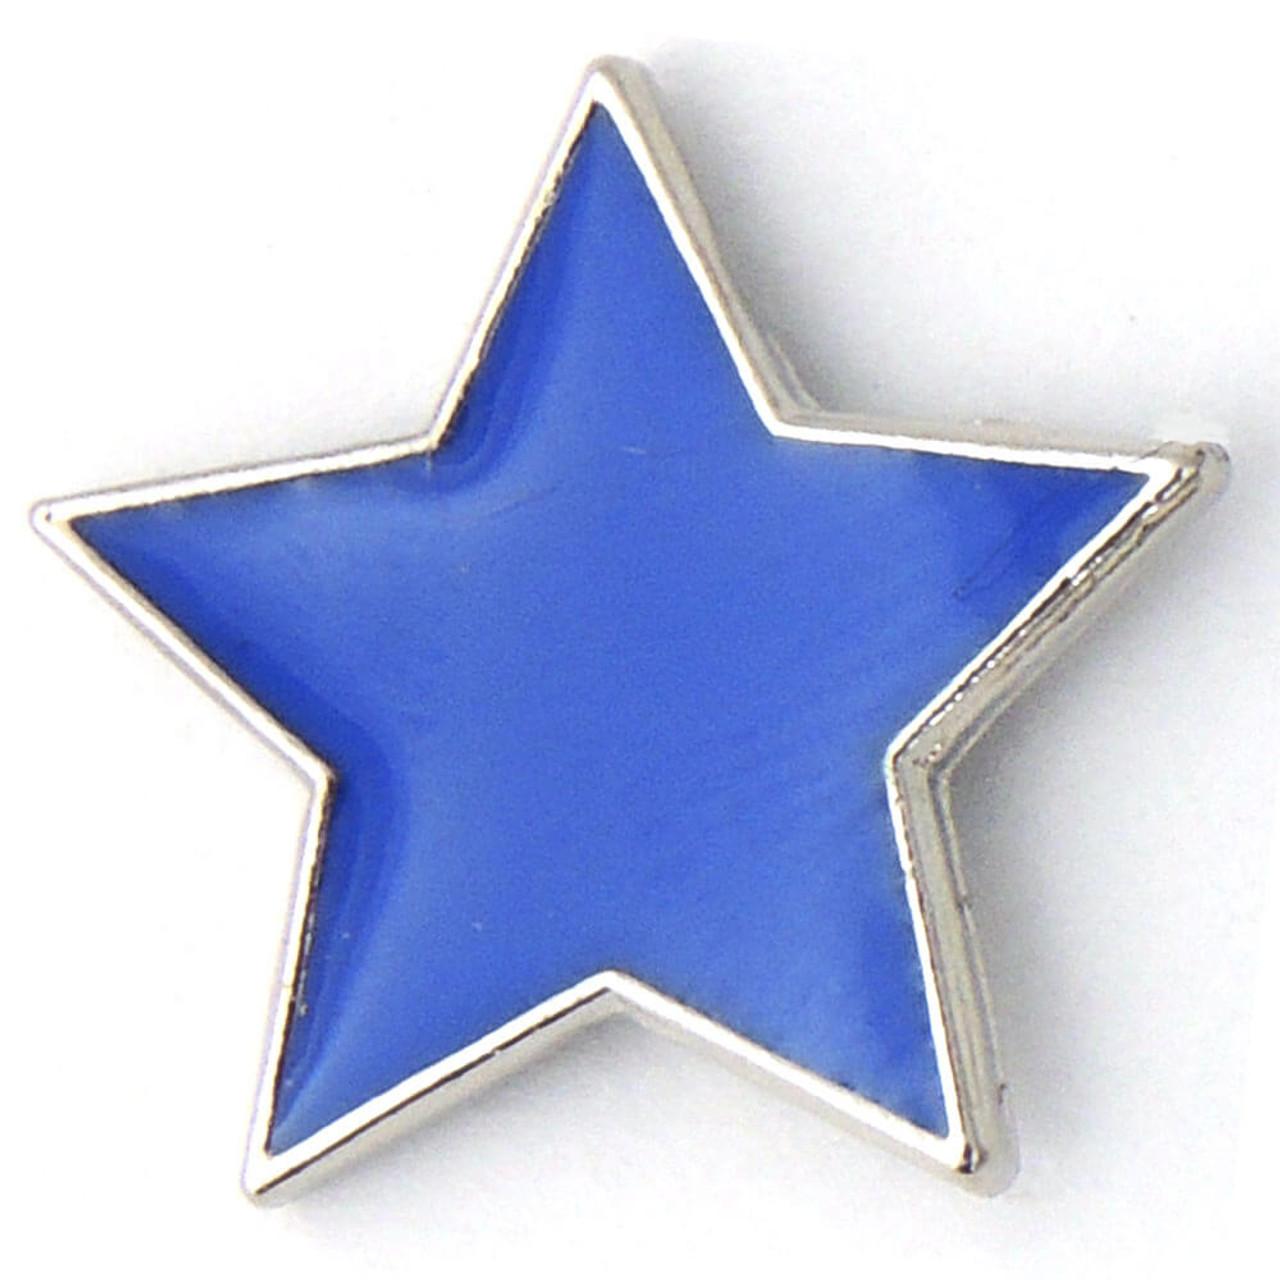 J34 - Colored Star Shaped Lapel Pin